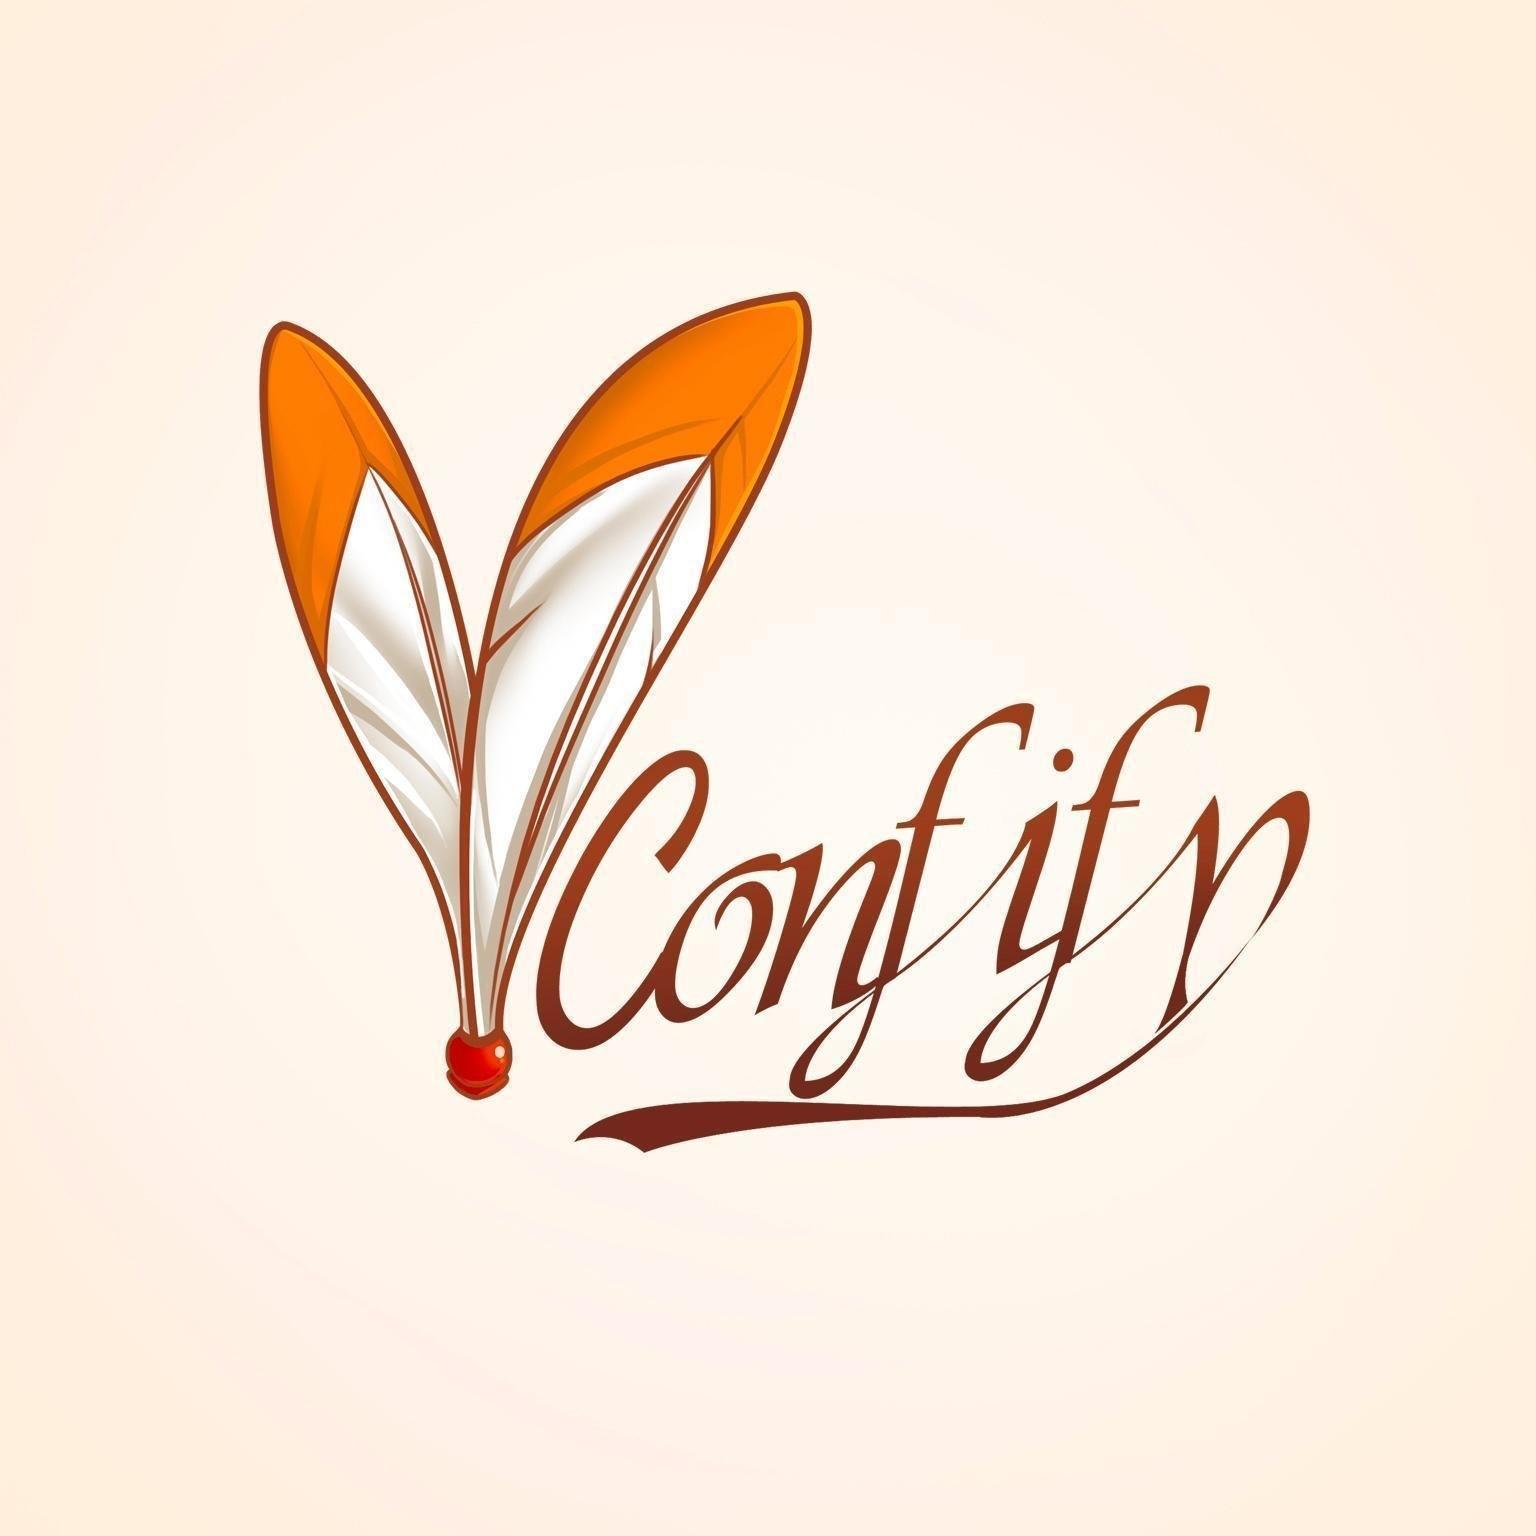 Confify